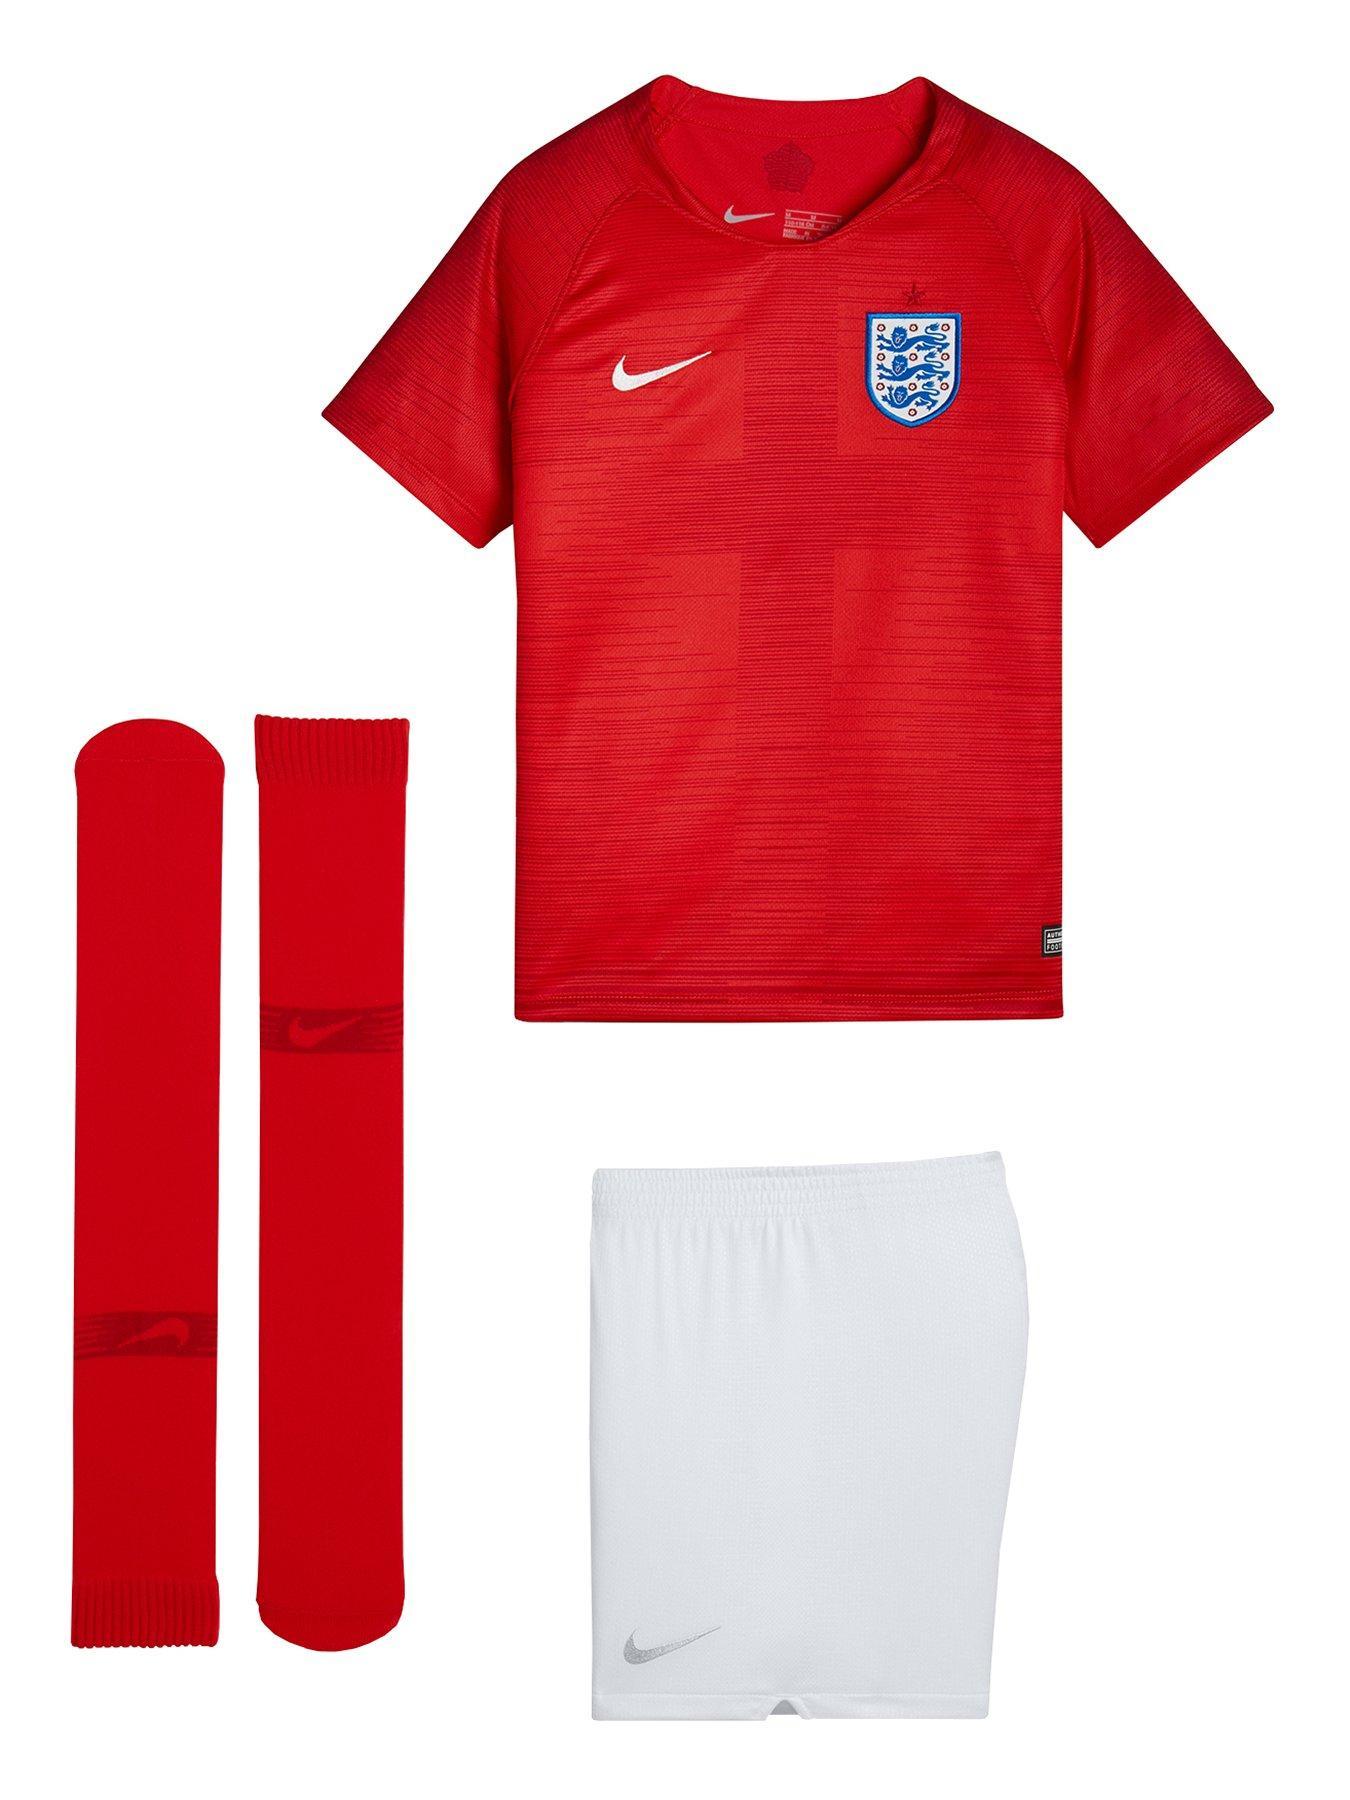 Nike Little Kids England Away Kit - Red/White